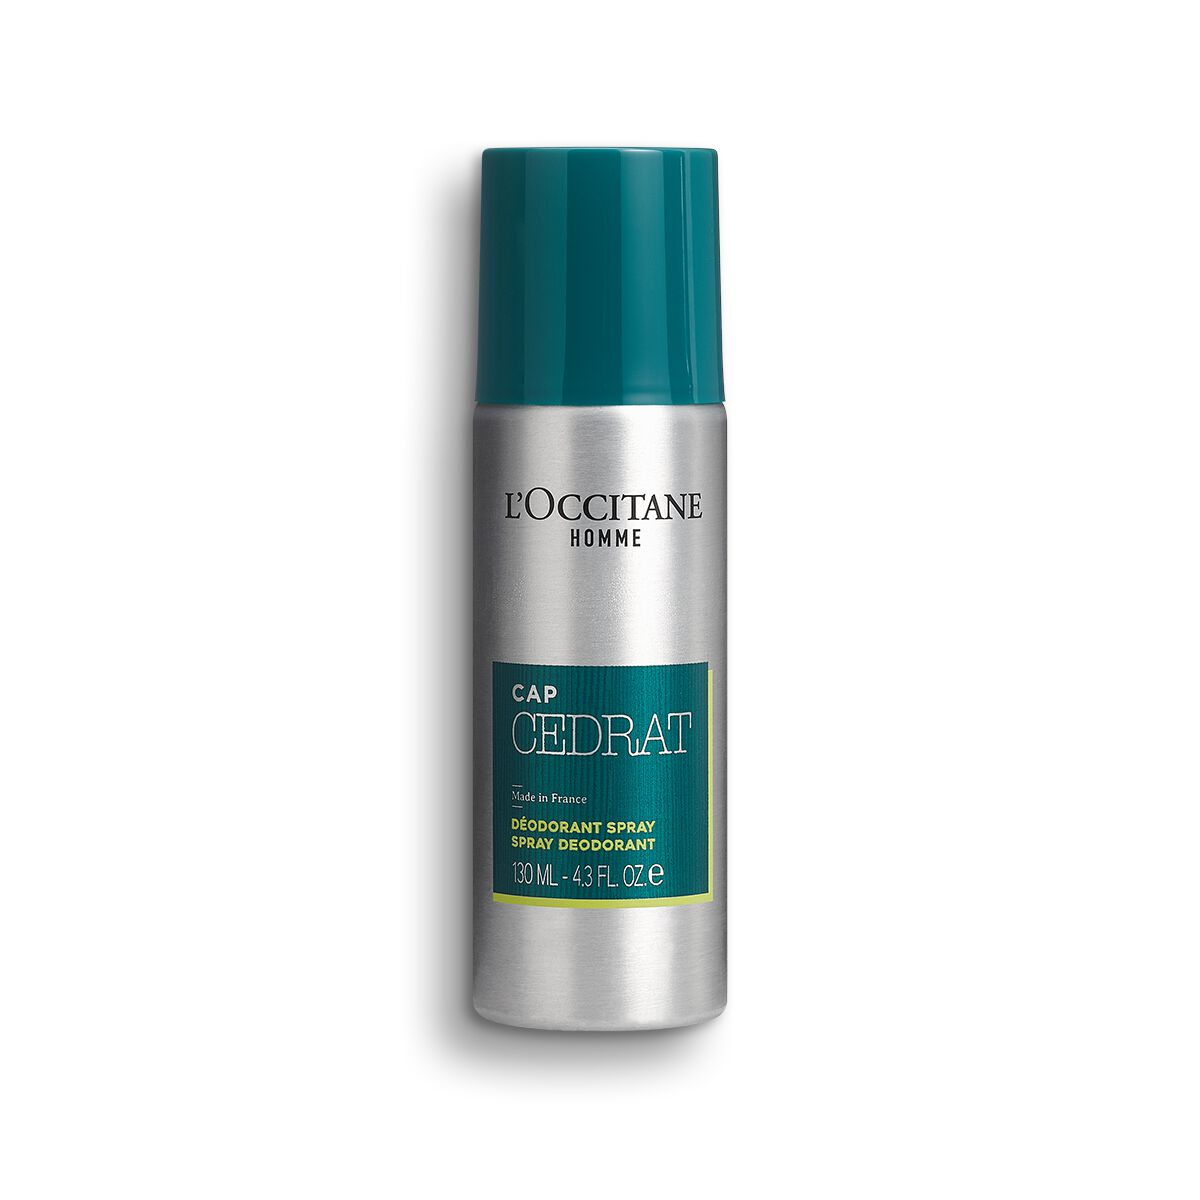 Cap Cedrat Spray Deodorant 4.3 fl. oz.